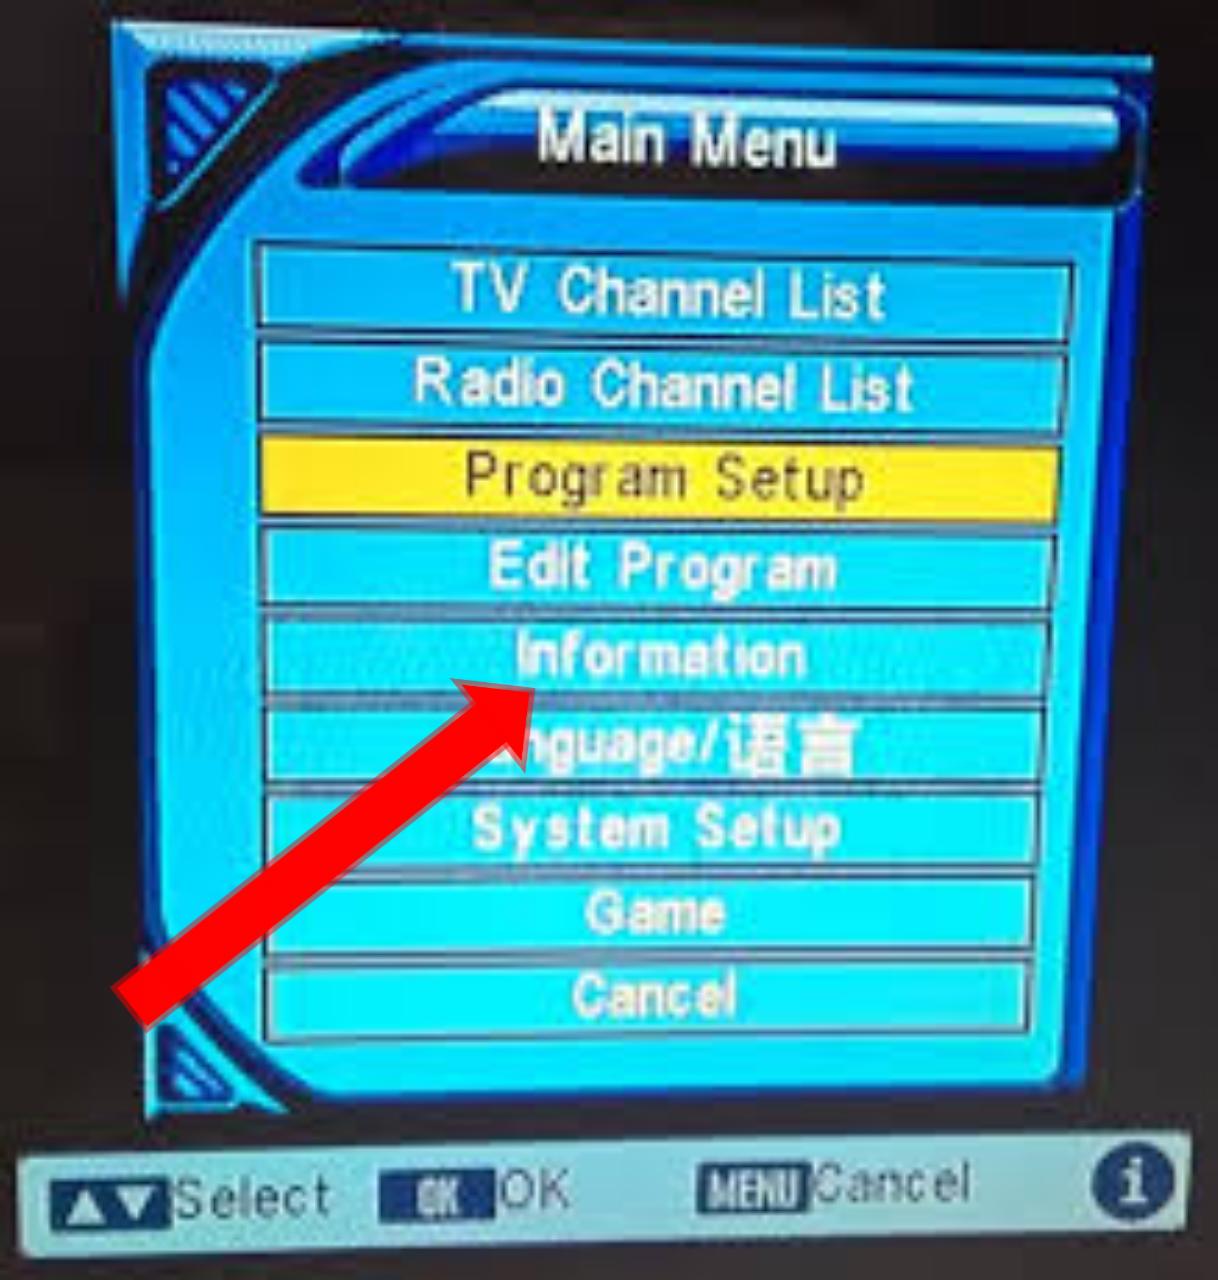 How to set dd free dish signal setting/ free dish ke signal kaise